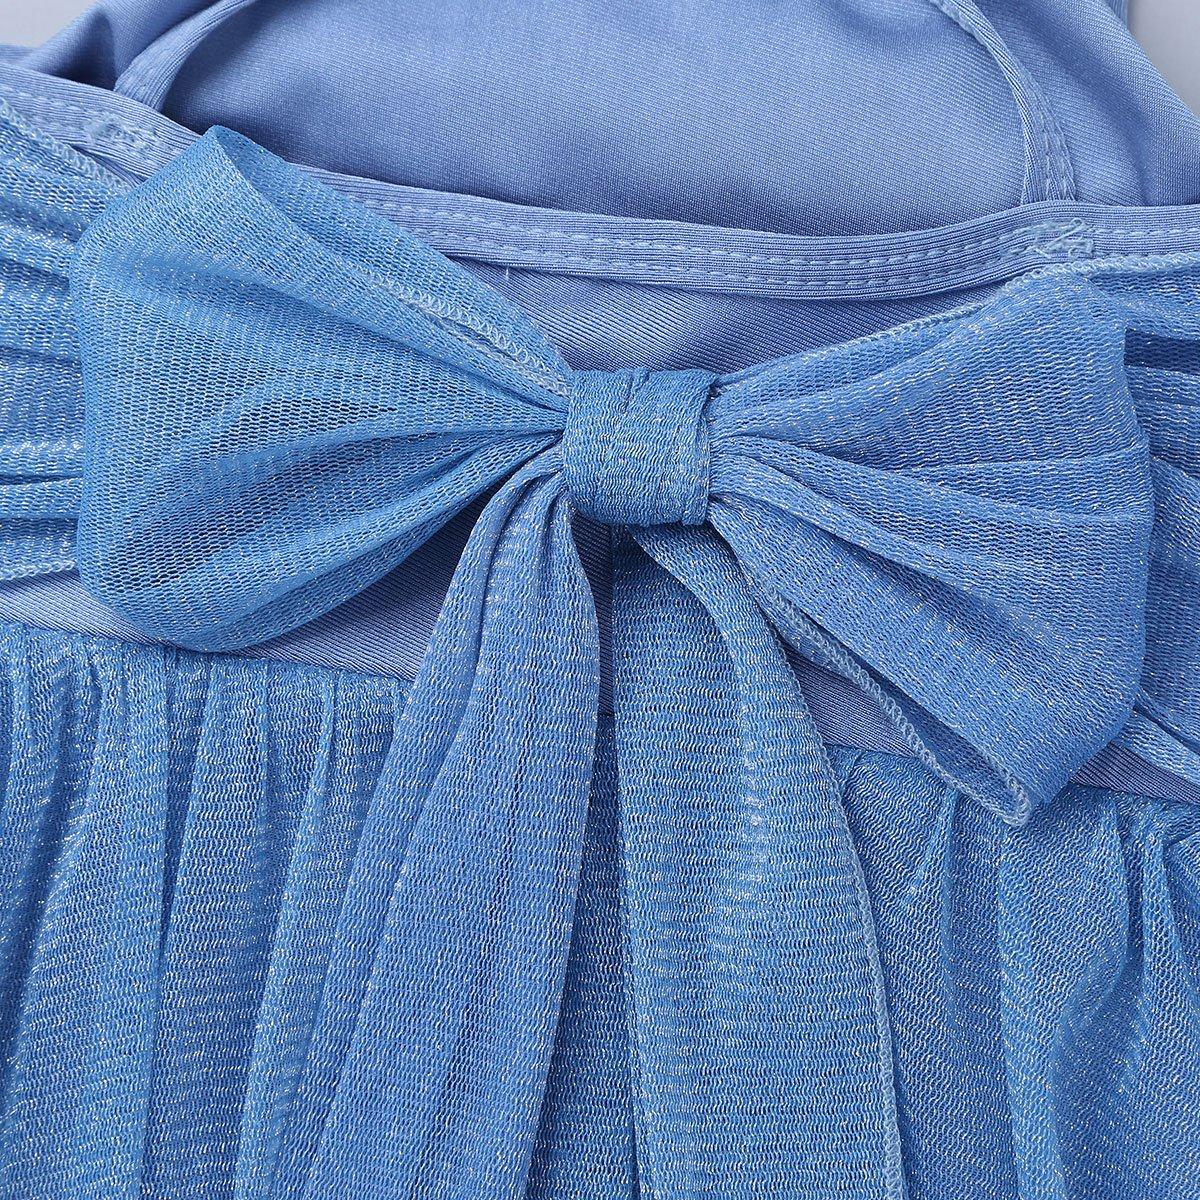 YiZYiF Girls Glittery Mesh Overlay Lyrical Dance Dress Stage Ballet Ballroom Dancing Costumes